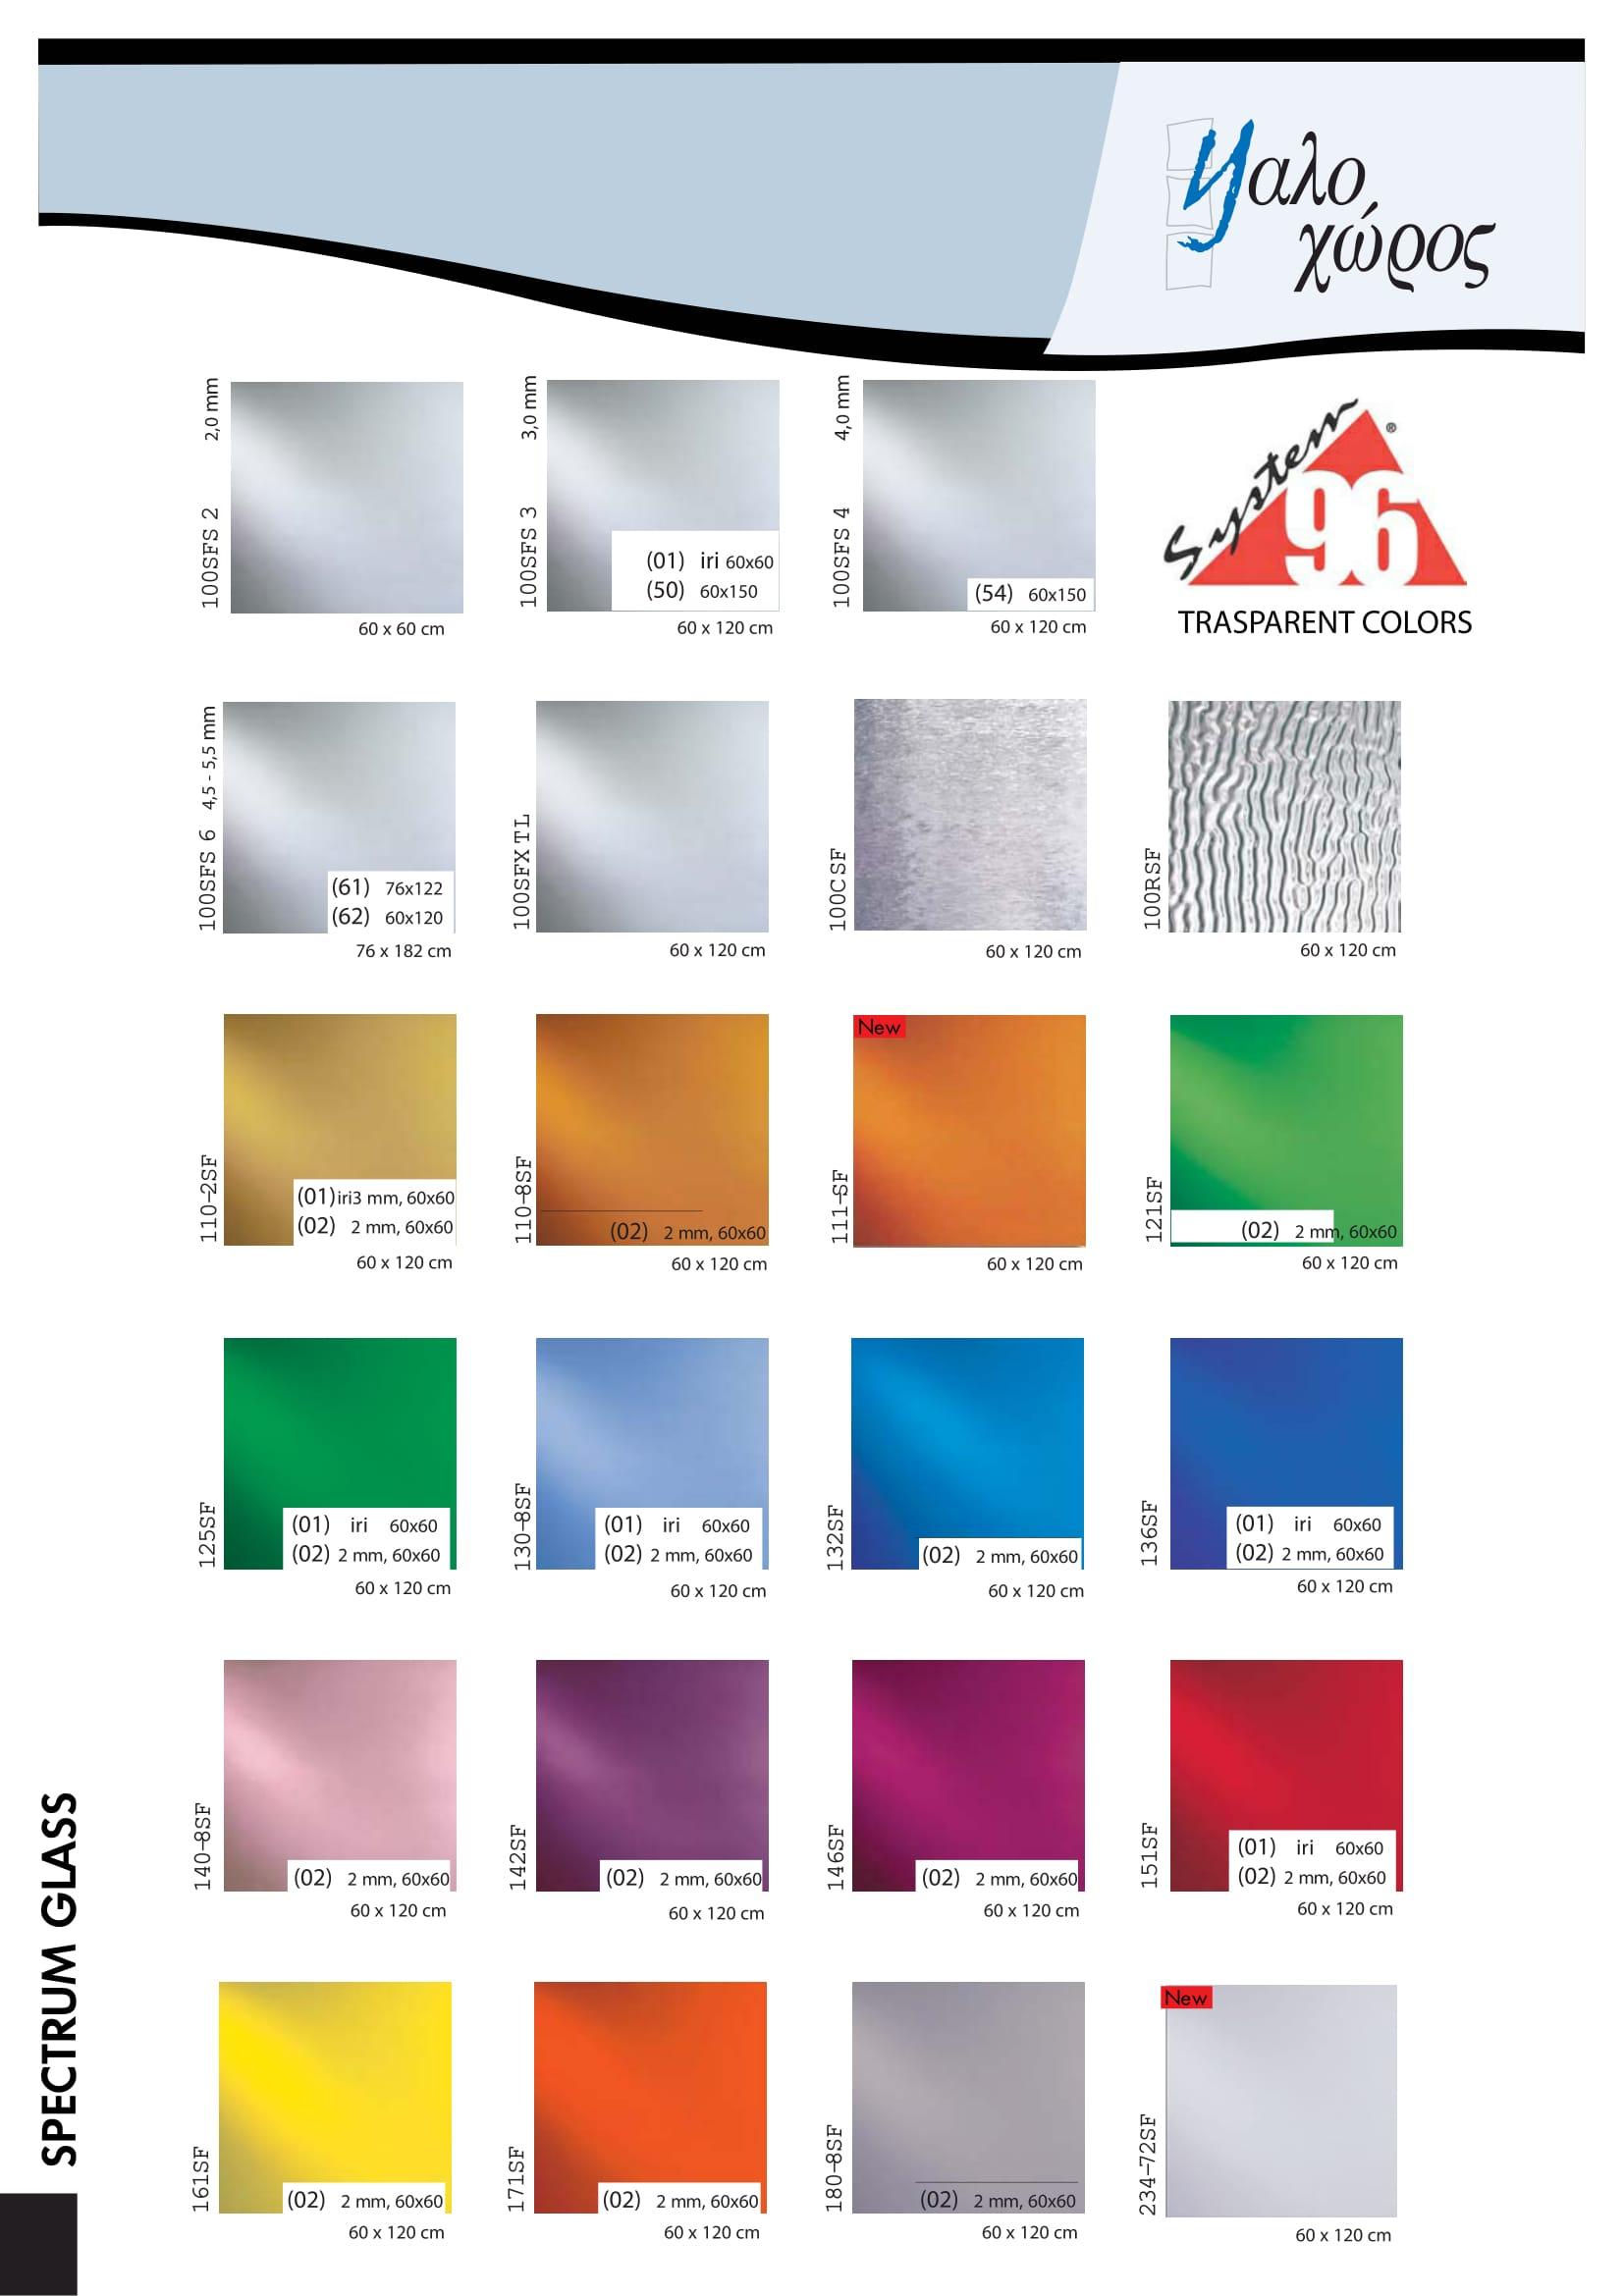 1. Spectrum Glass